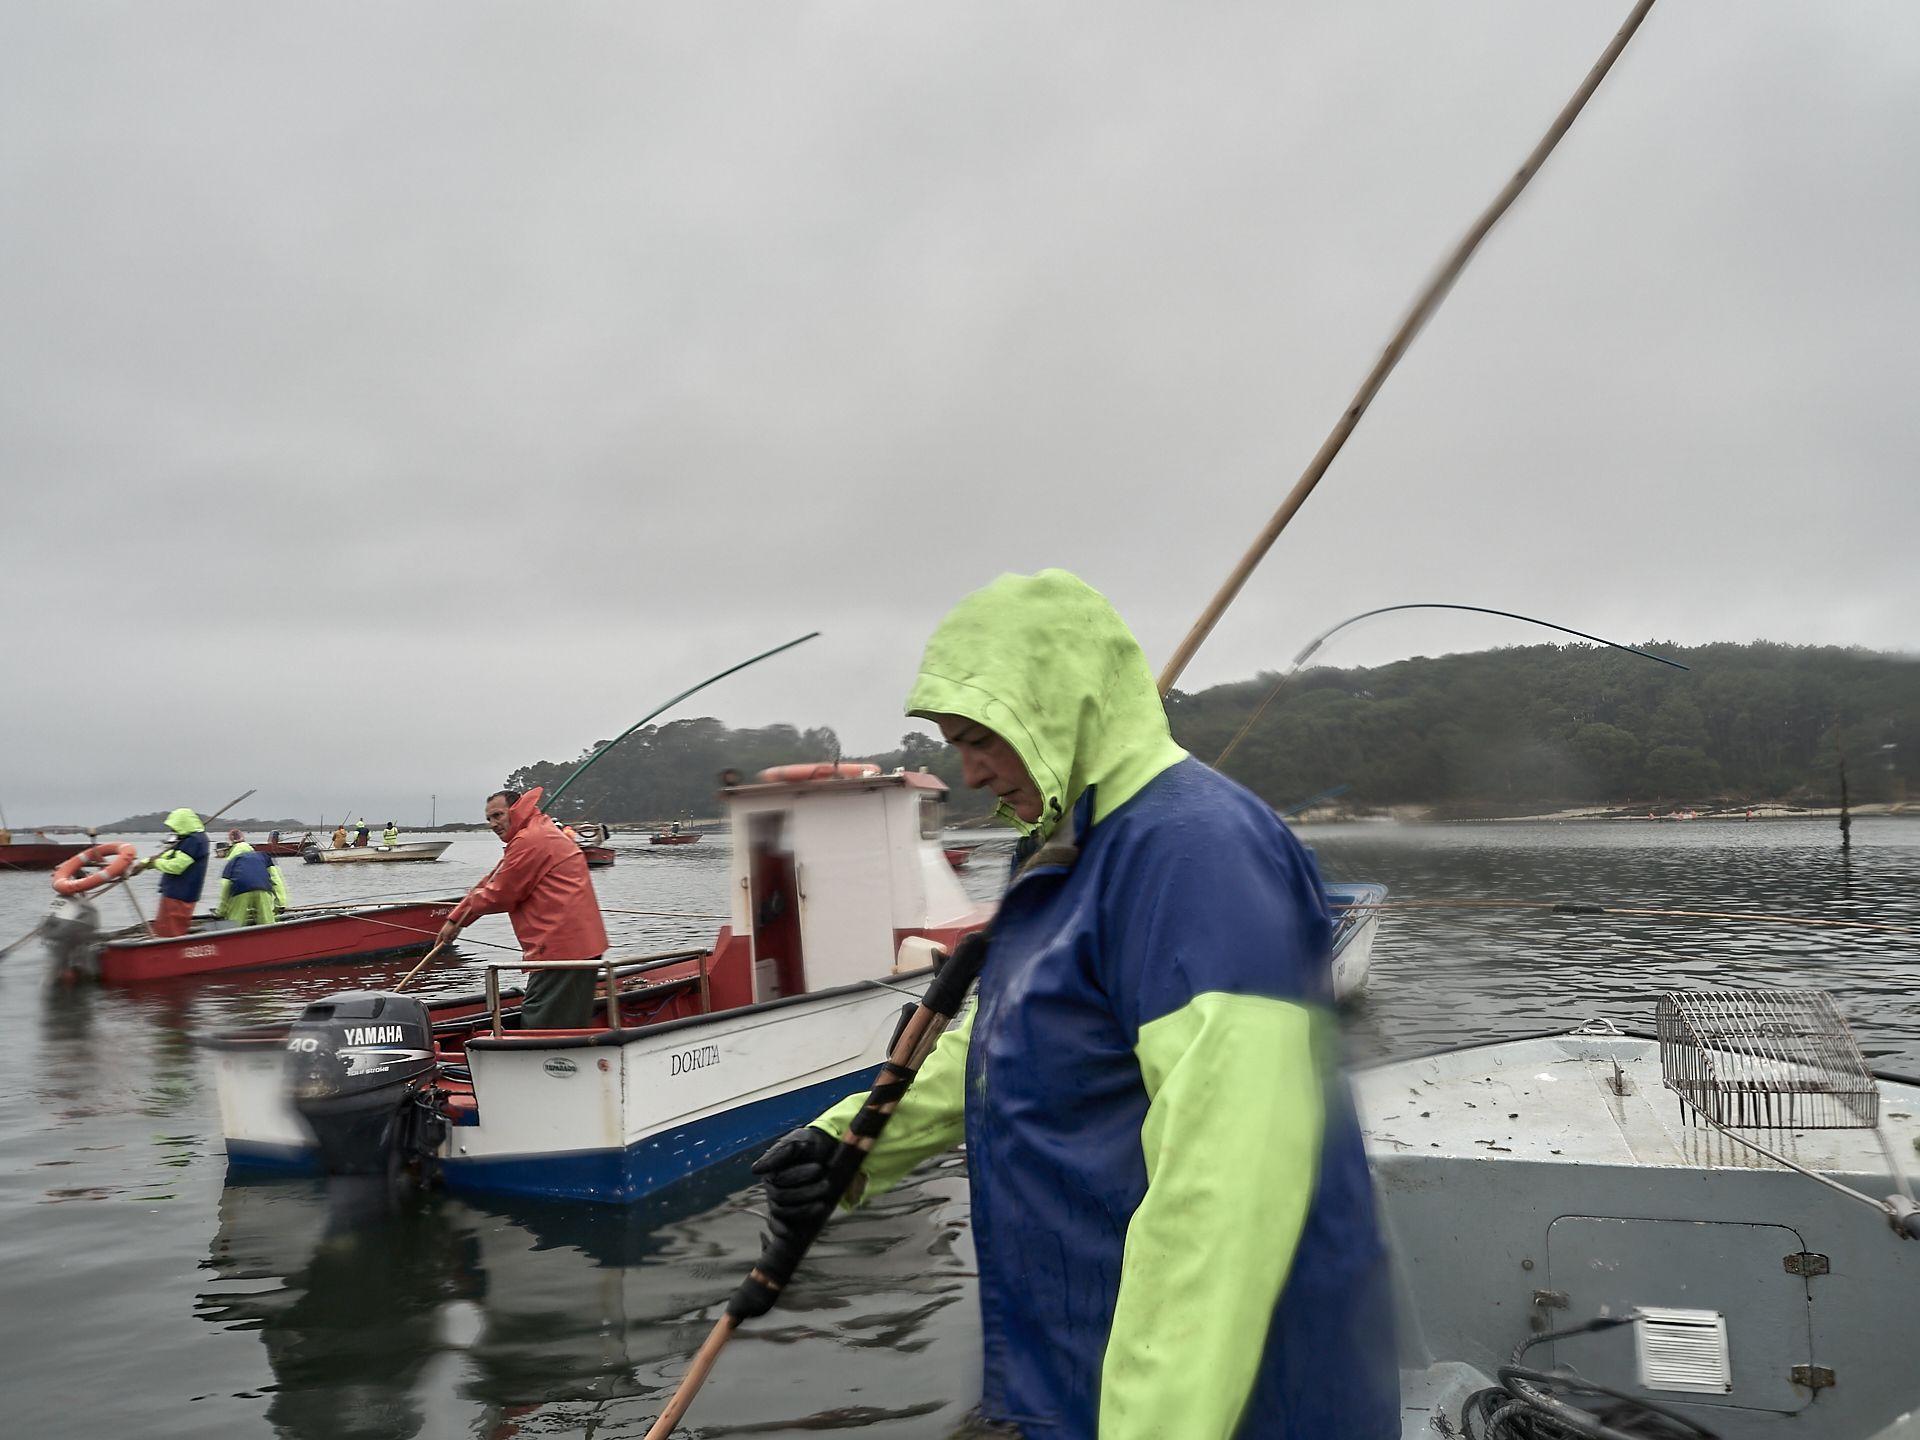 20160817 Carolina mariscadora (271).jpg